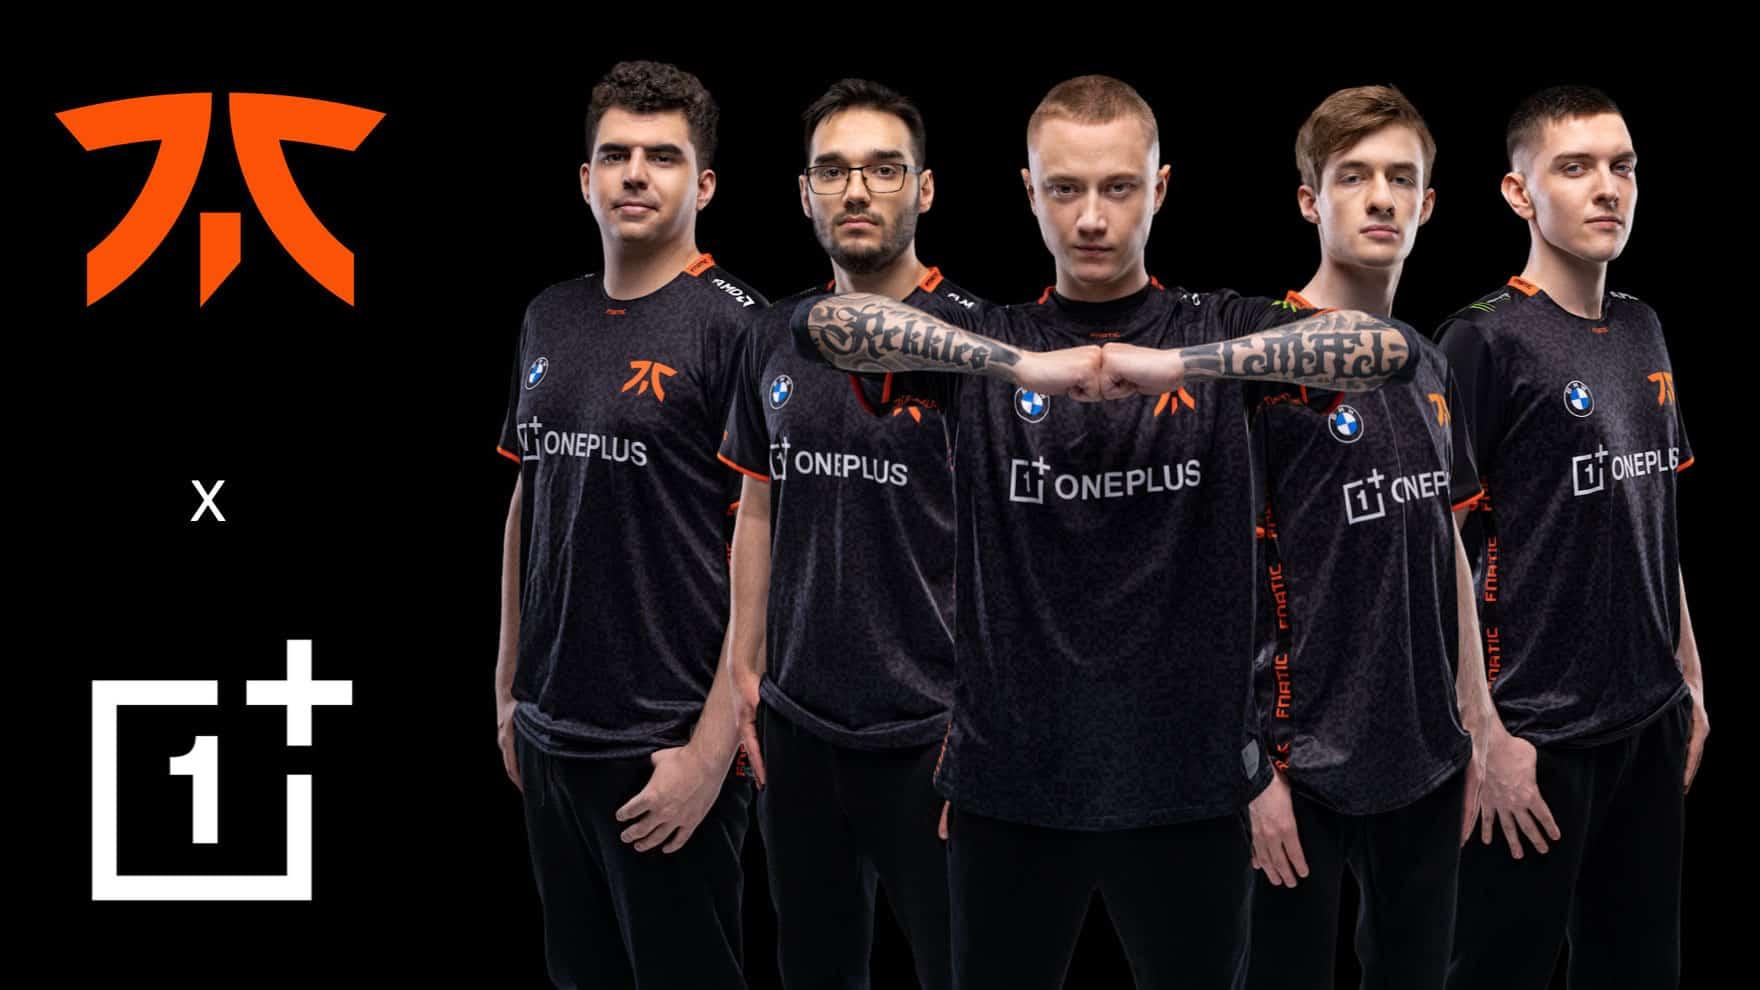 Fnatic Team Photo babt